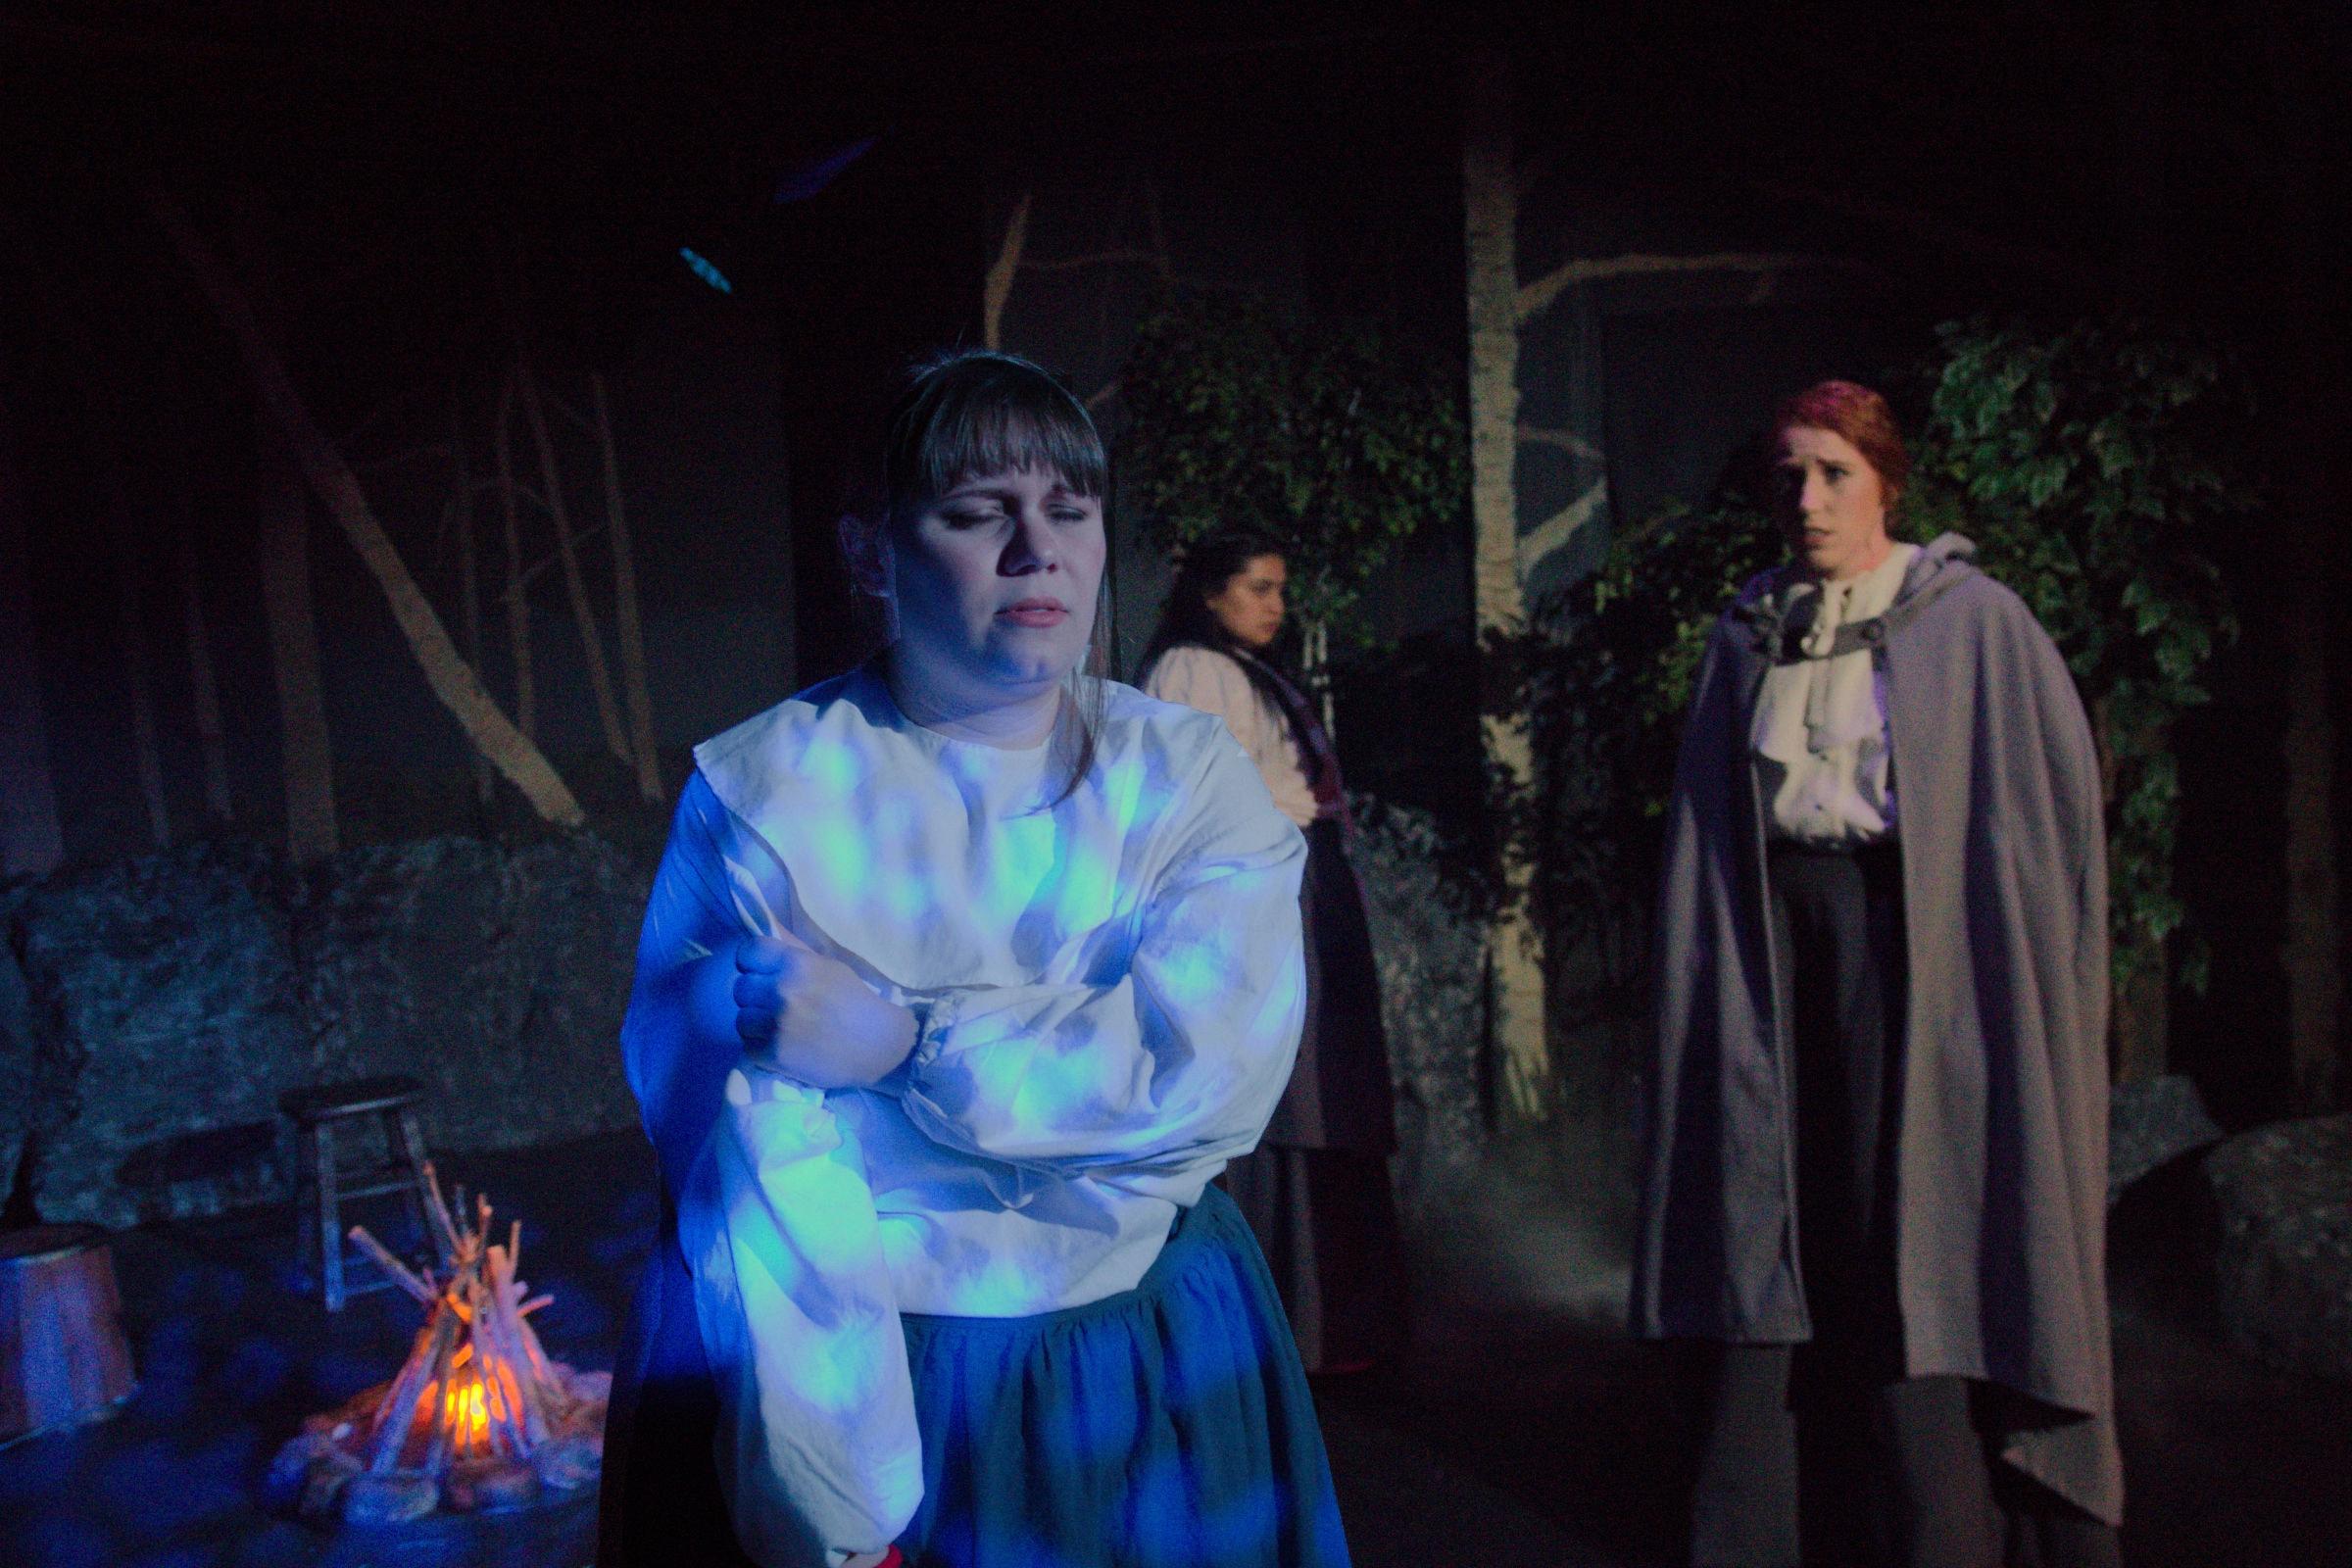 Left to Right: Megan Safko (Mercy Lewis), Malissa Cruz Romero (Abigail Williams), Sarah Luckadoo (Ann Putnam Jr.) Photo by John Cholod..